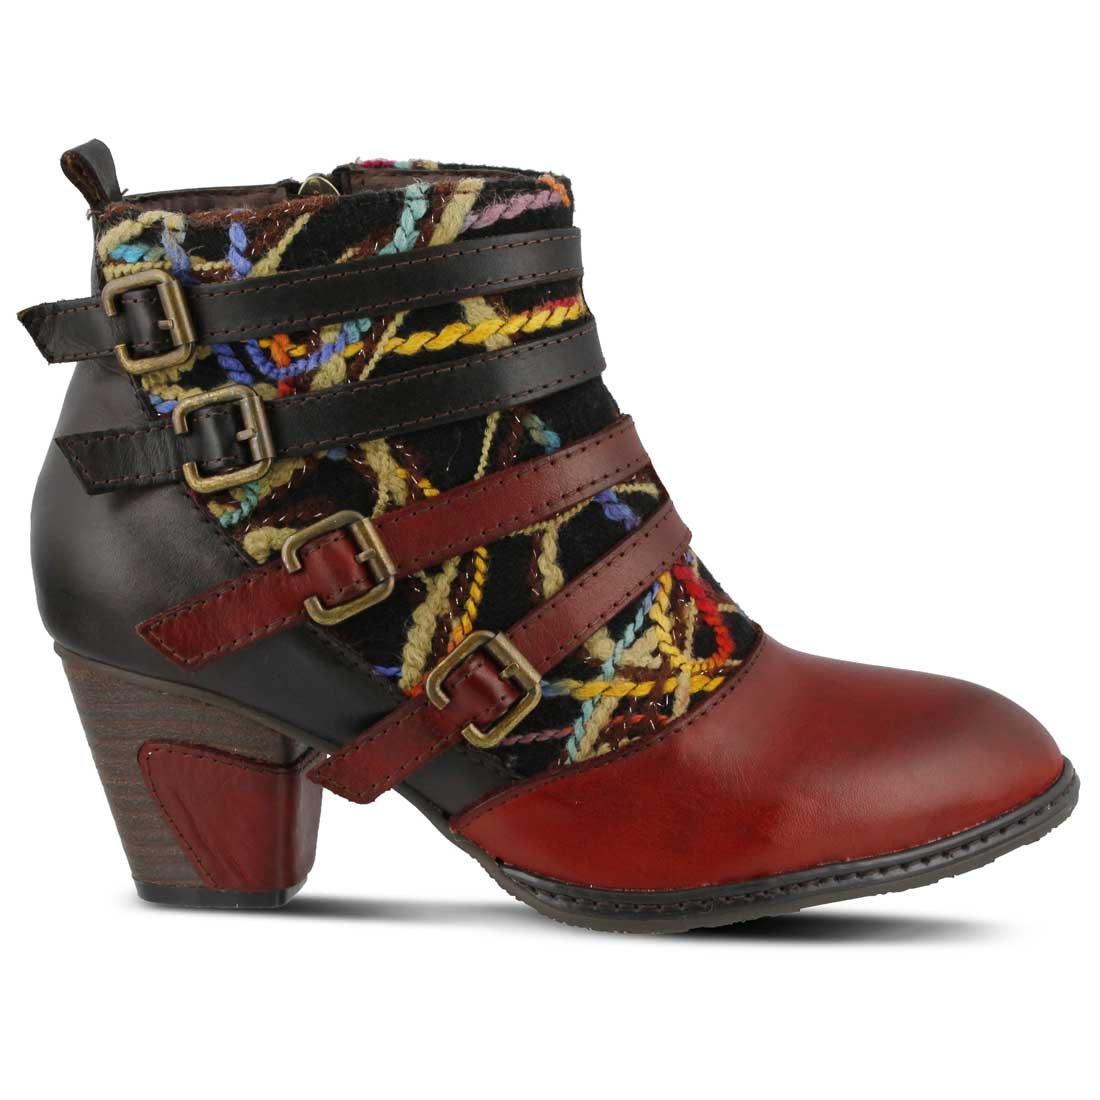 L'Artiste by Spring Step Women's Redding Boot B00XW5FD2A 42 EU/10.5-11 M US Red/Multi